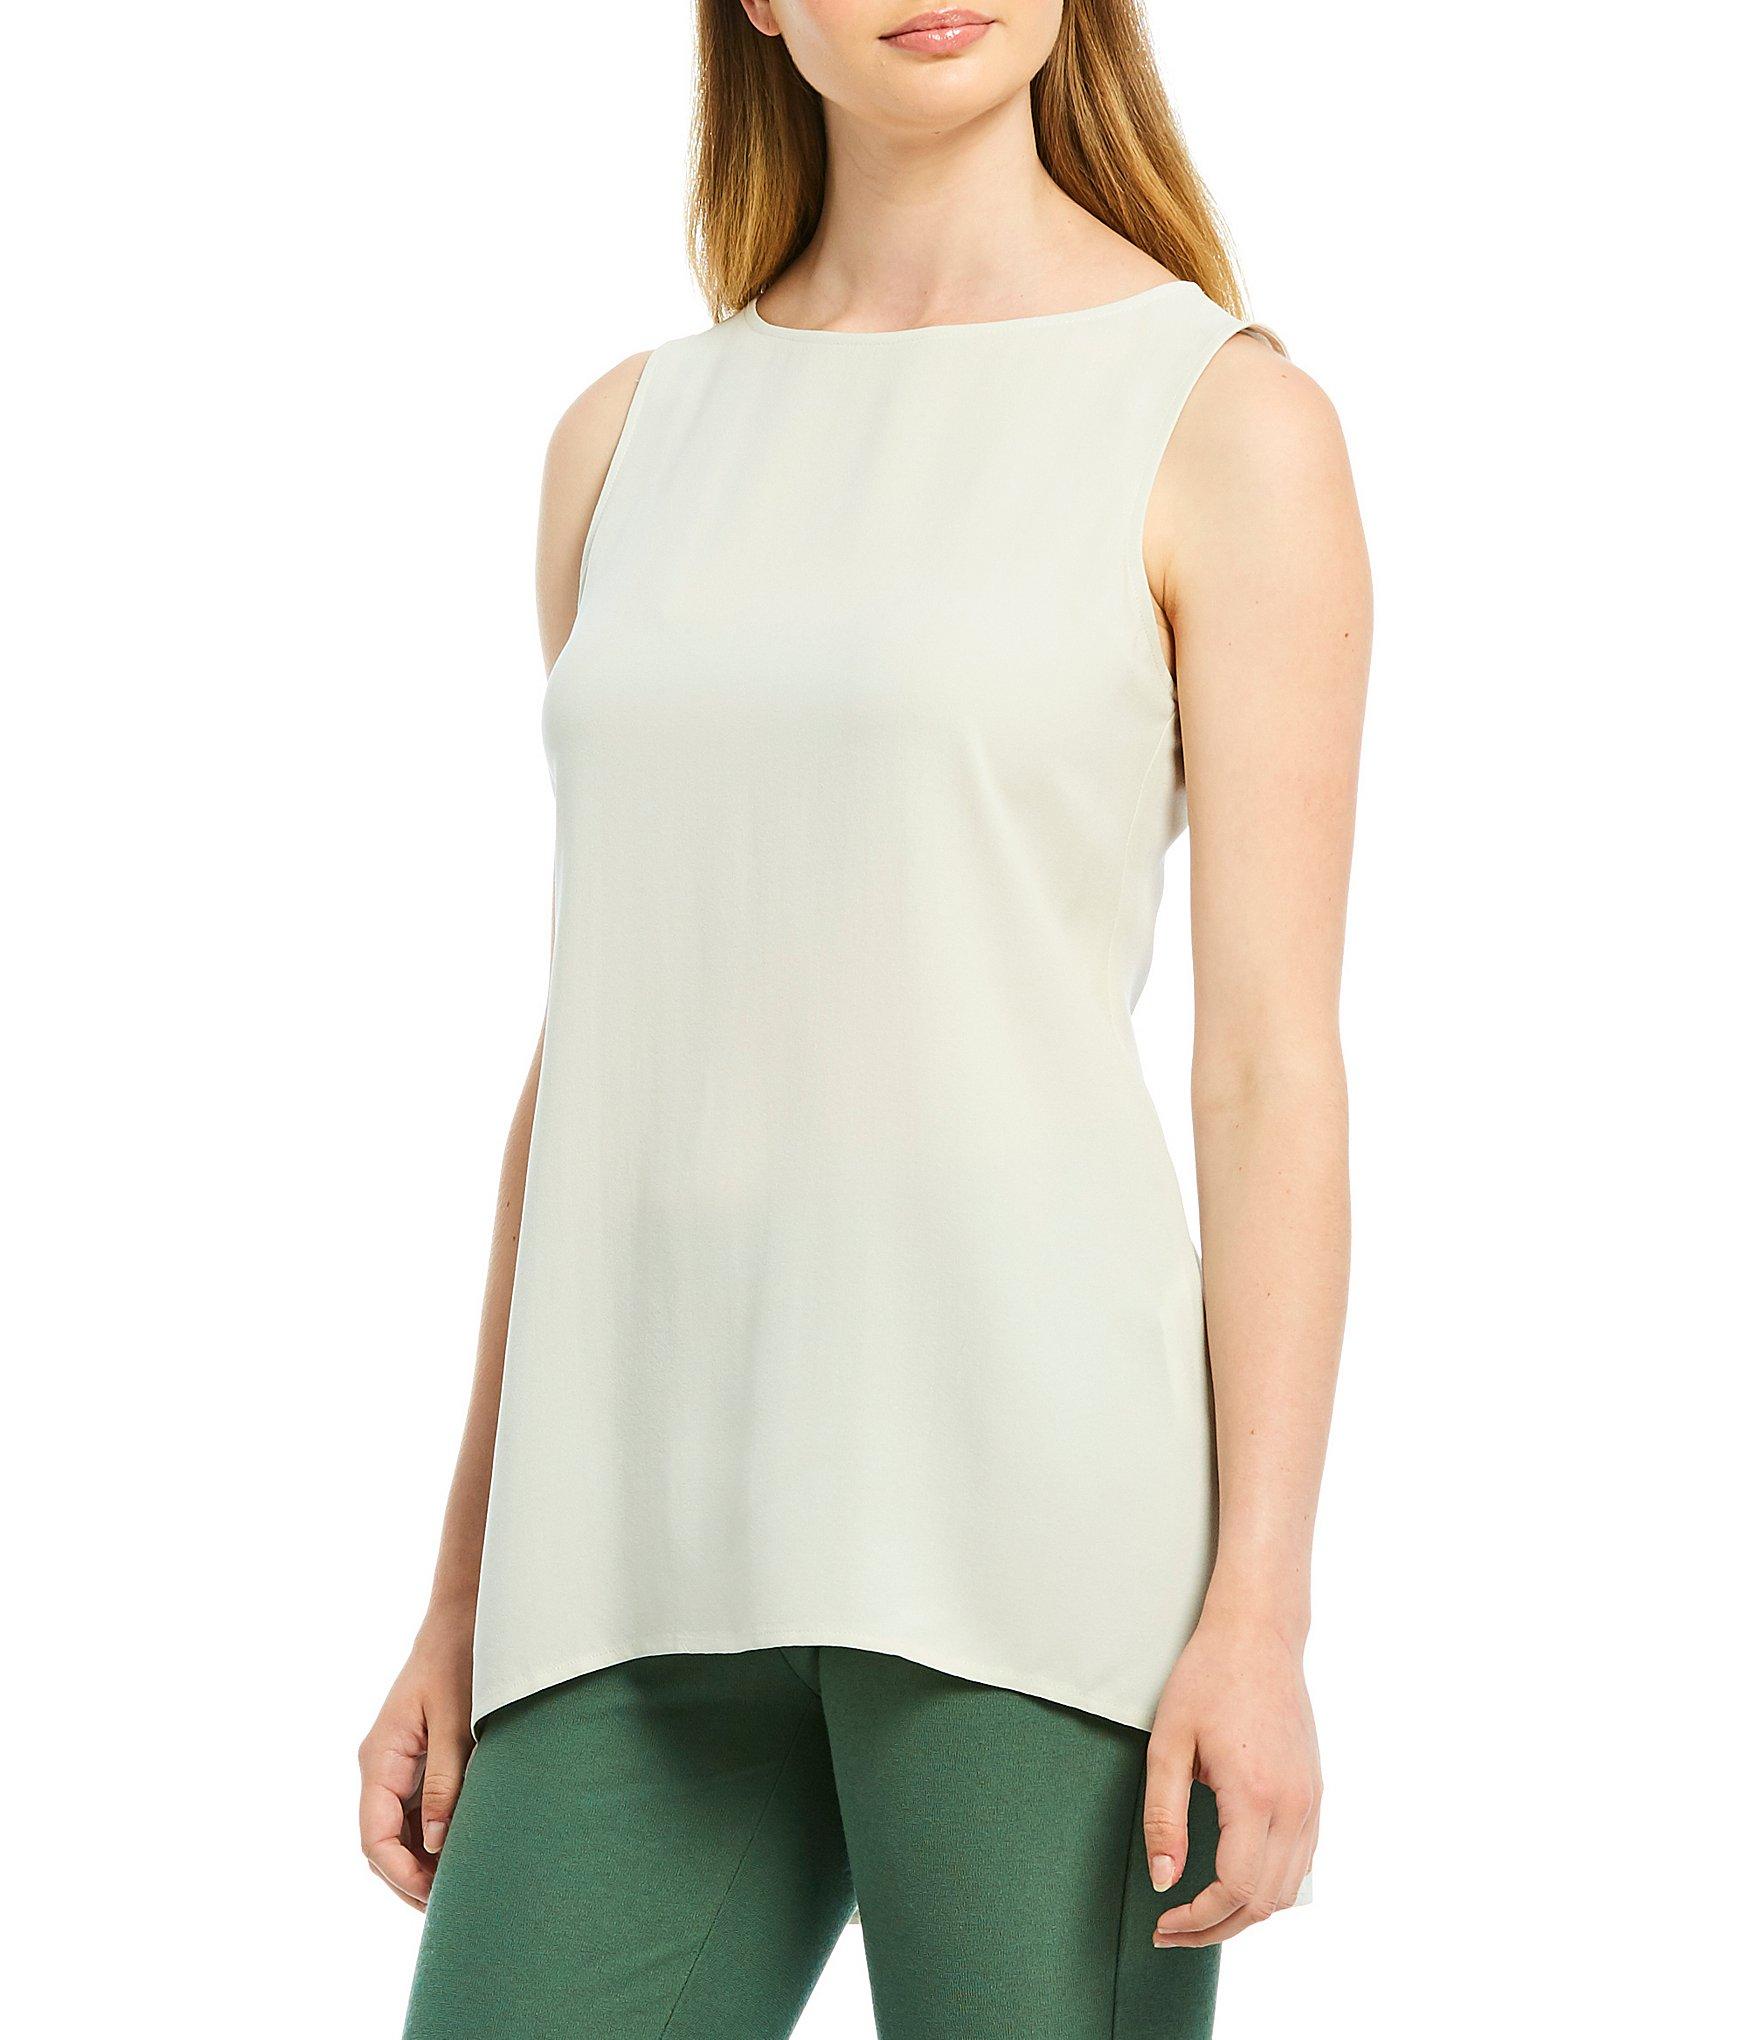 c8e65a1713d xs  Women s Clothing   Apparel